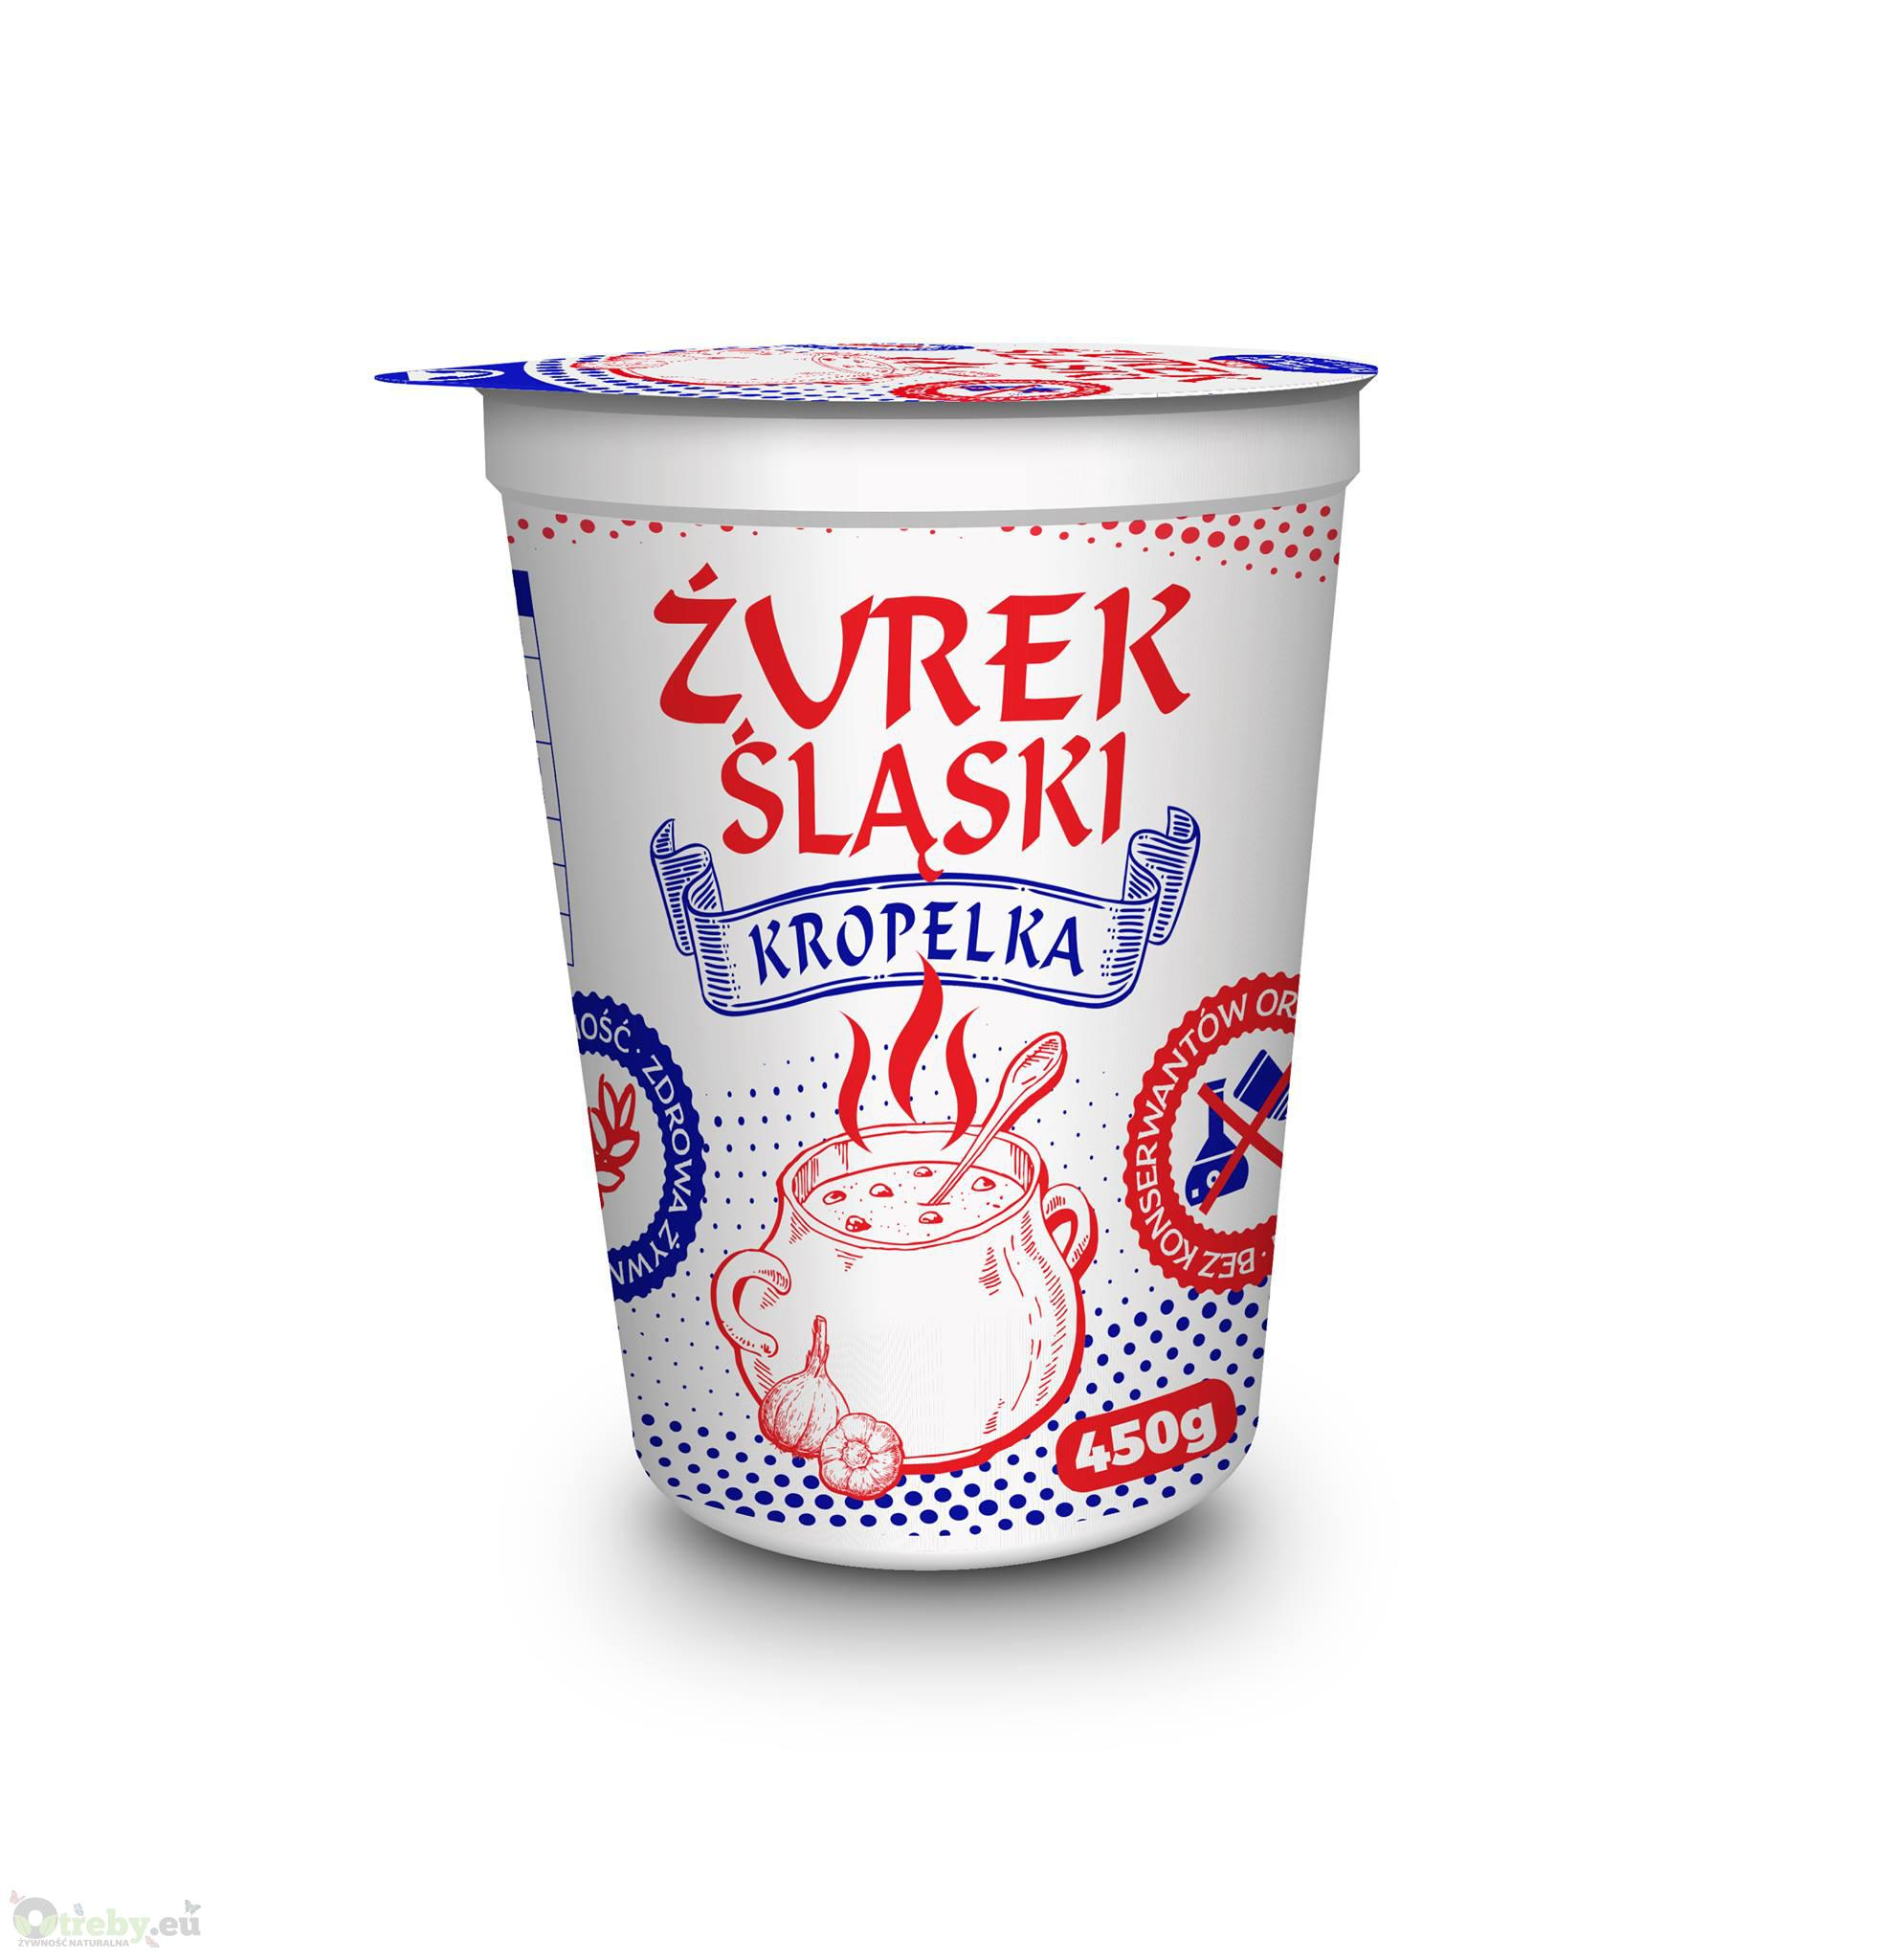 ŻUREK ŚLĄSKI KUBEK 450 G KROPELKA